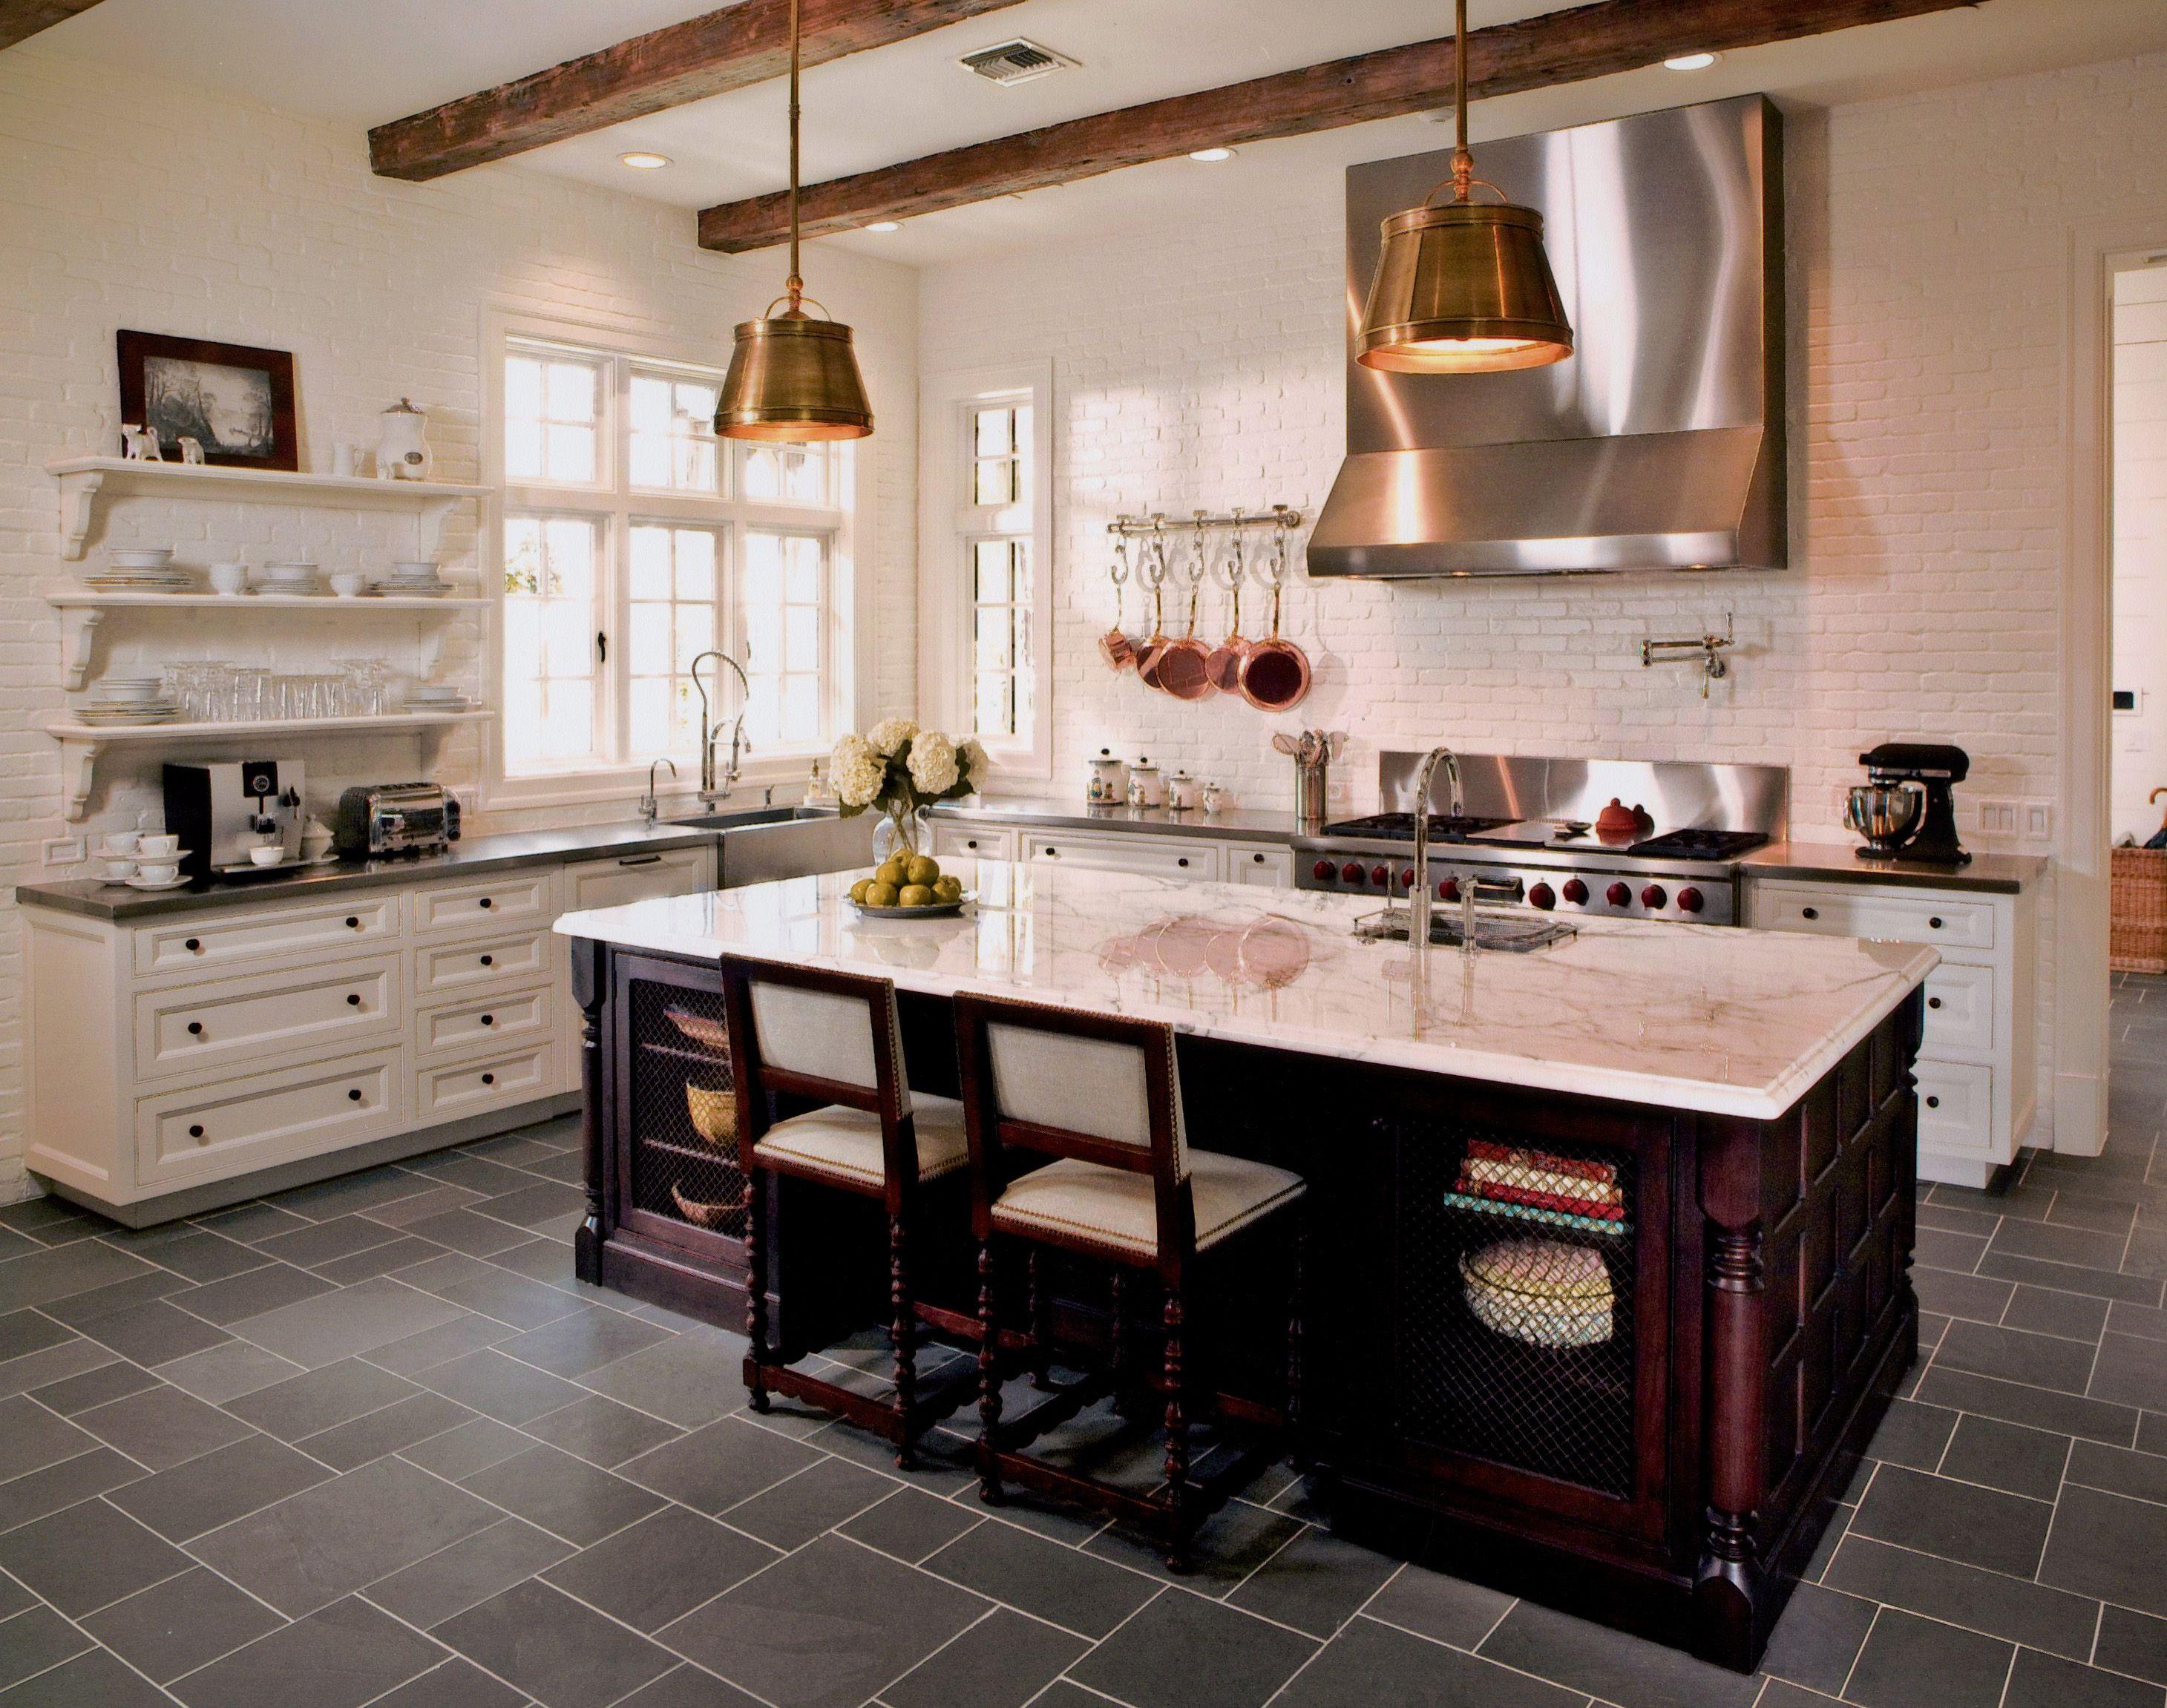 Pin by Tara Edelman on KItchen ideas   Solid wood kitchen ...